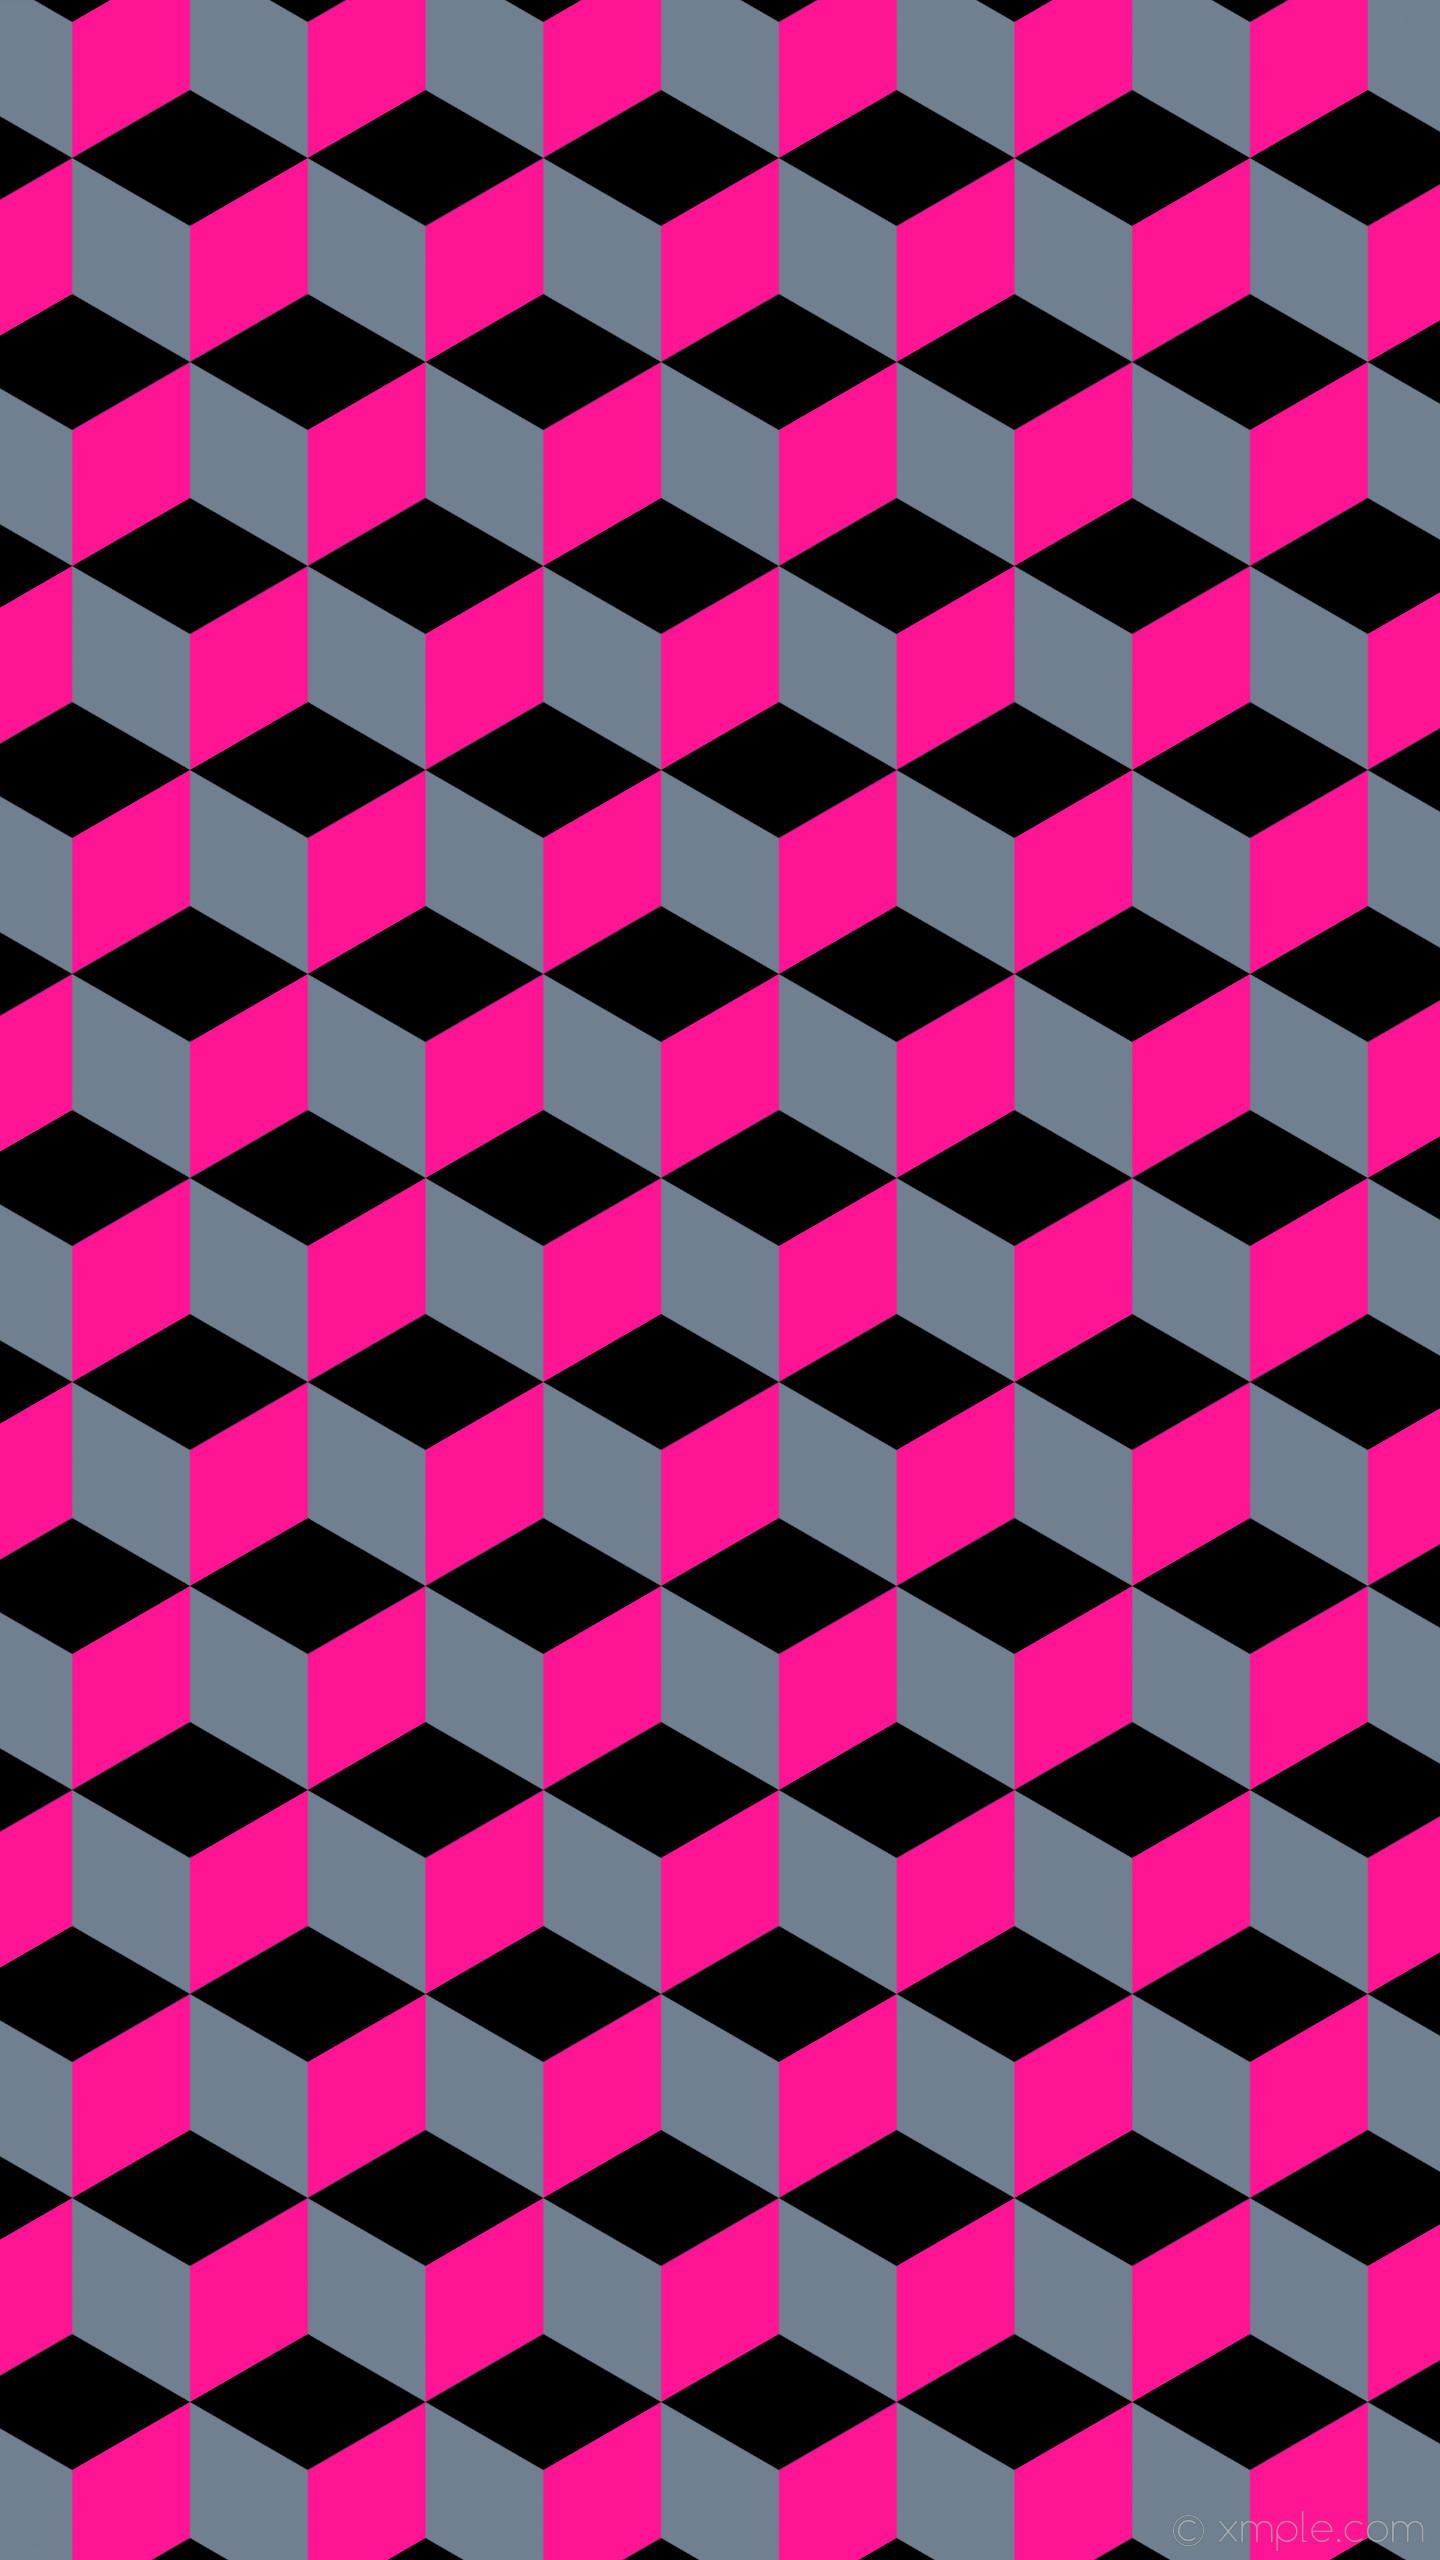 wallpaper pink black 3d cubes grey slate gray deep pink #708090 #ff1493  #000000